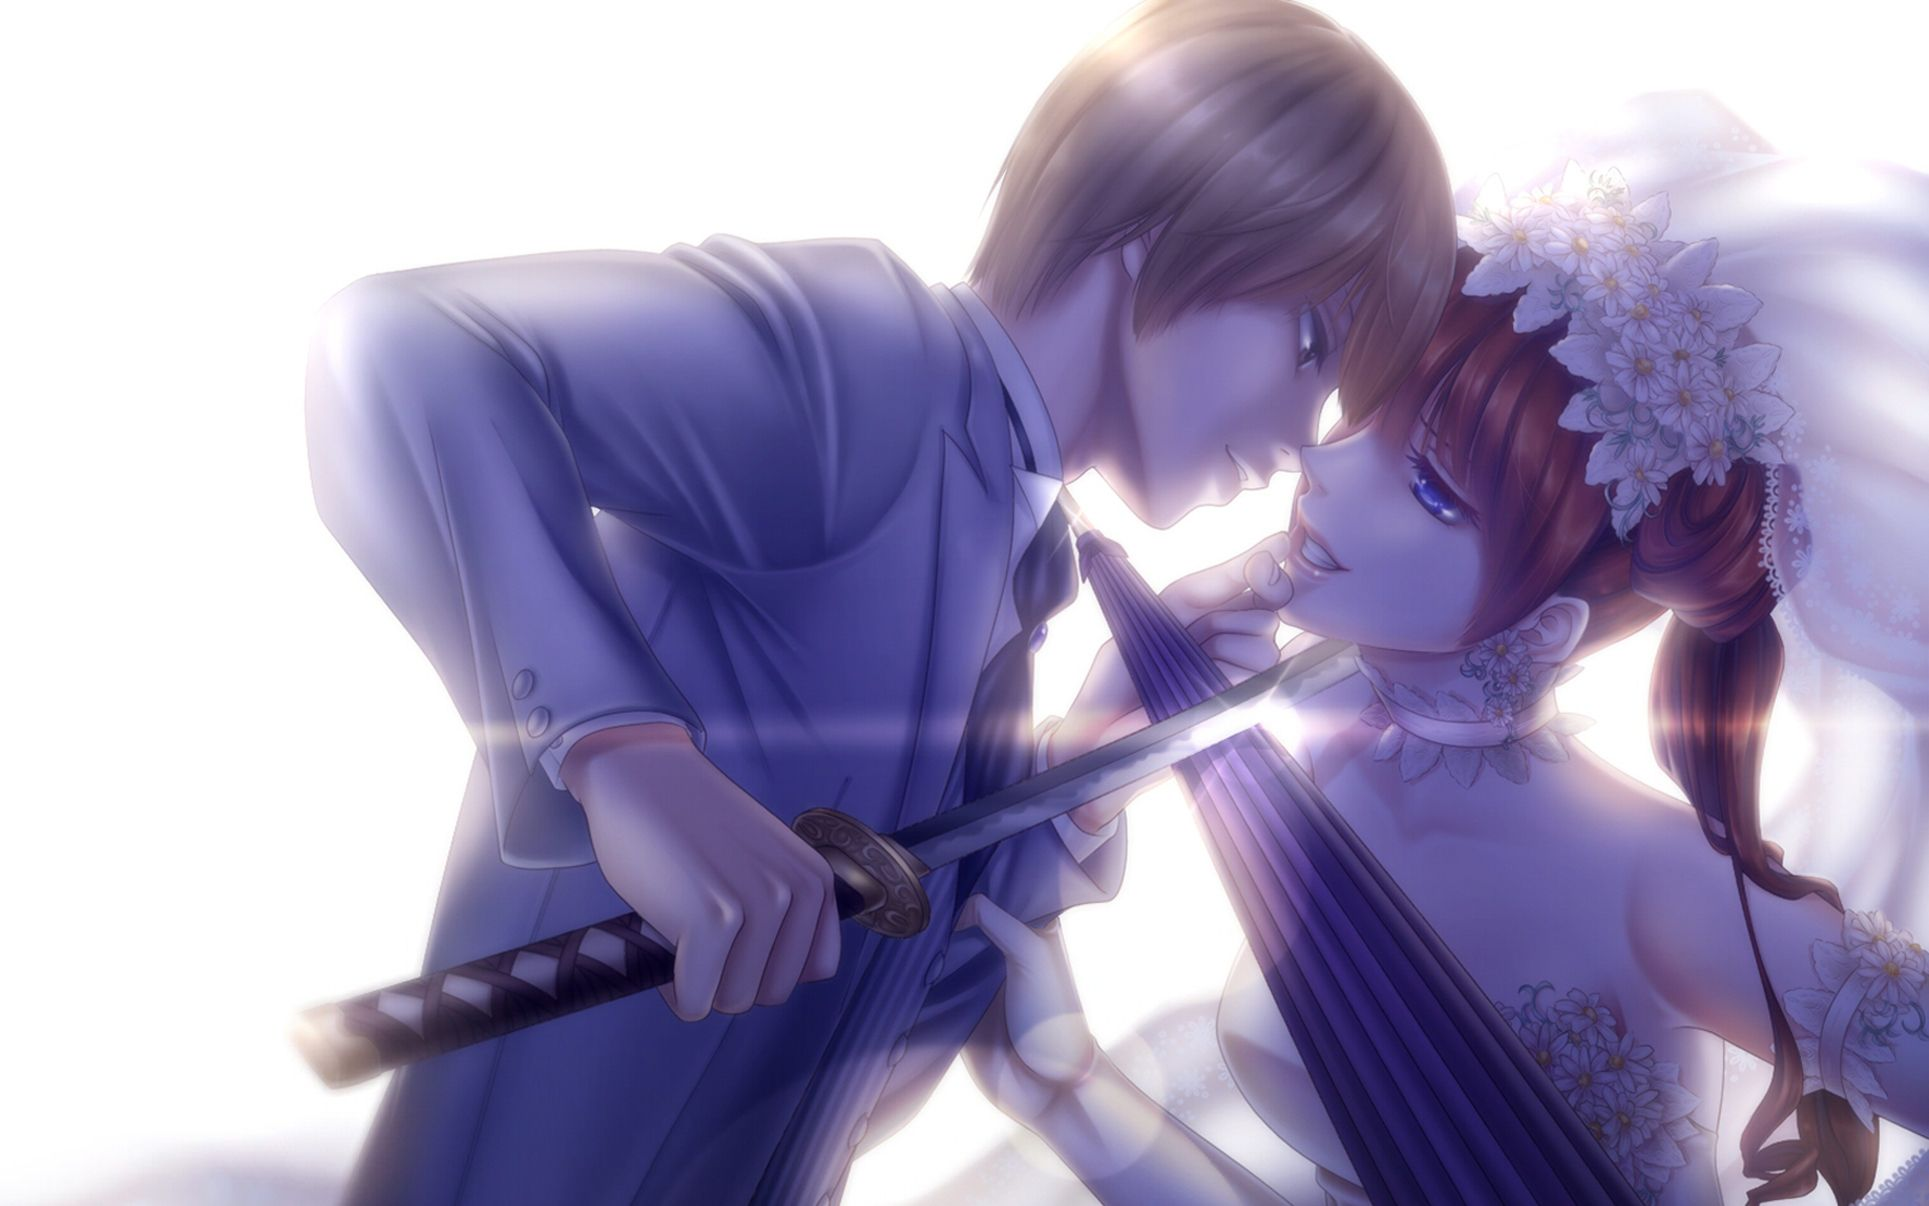 bride-and-groom-anime-couple-love-swords-art-roman-art-hd